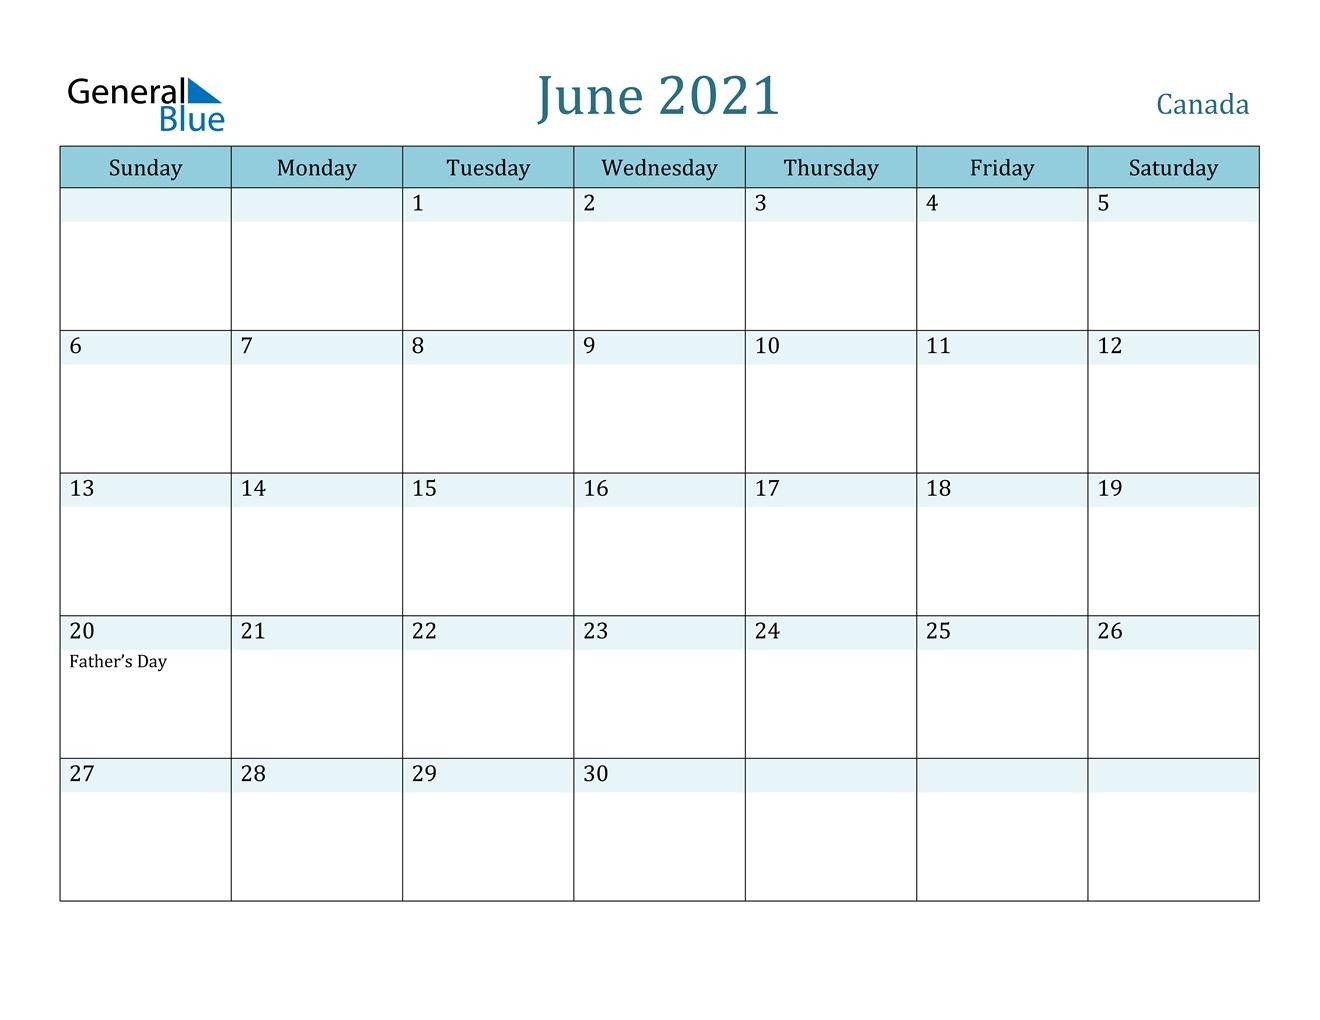 June 2021 Calendar - Canada June 2021 Calendar Kuda